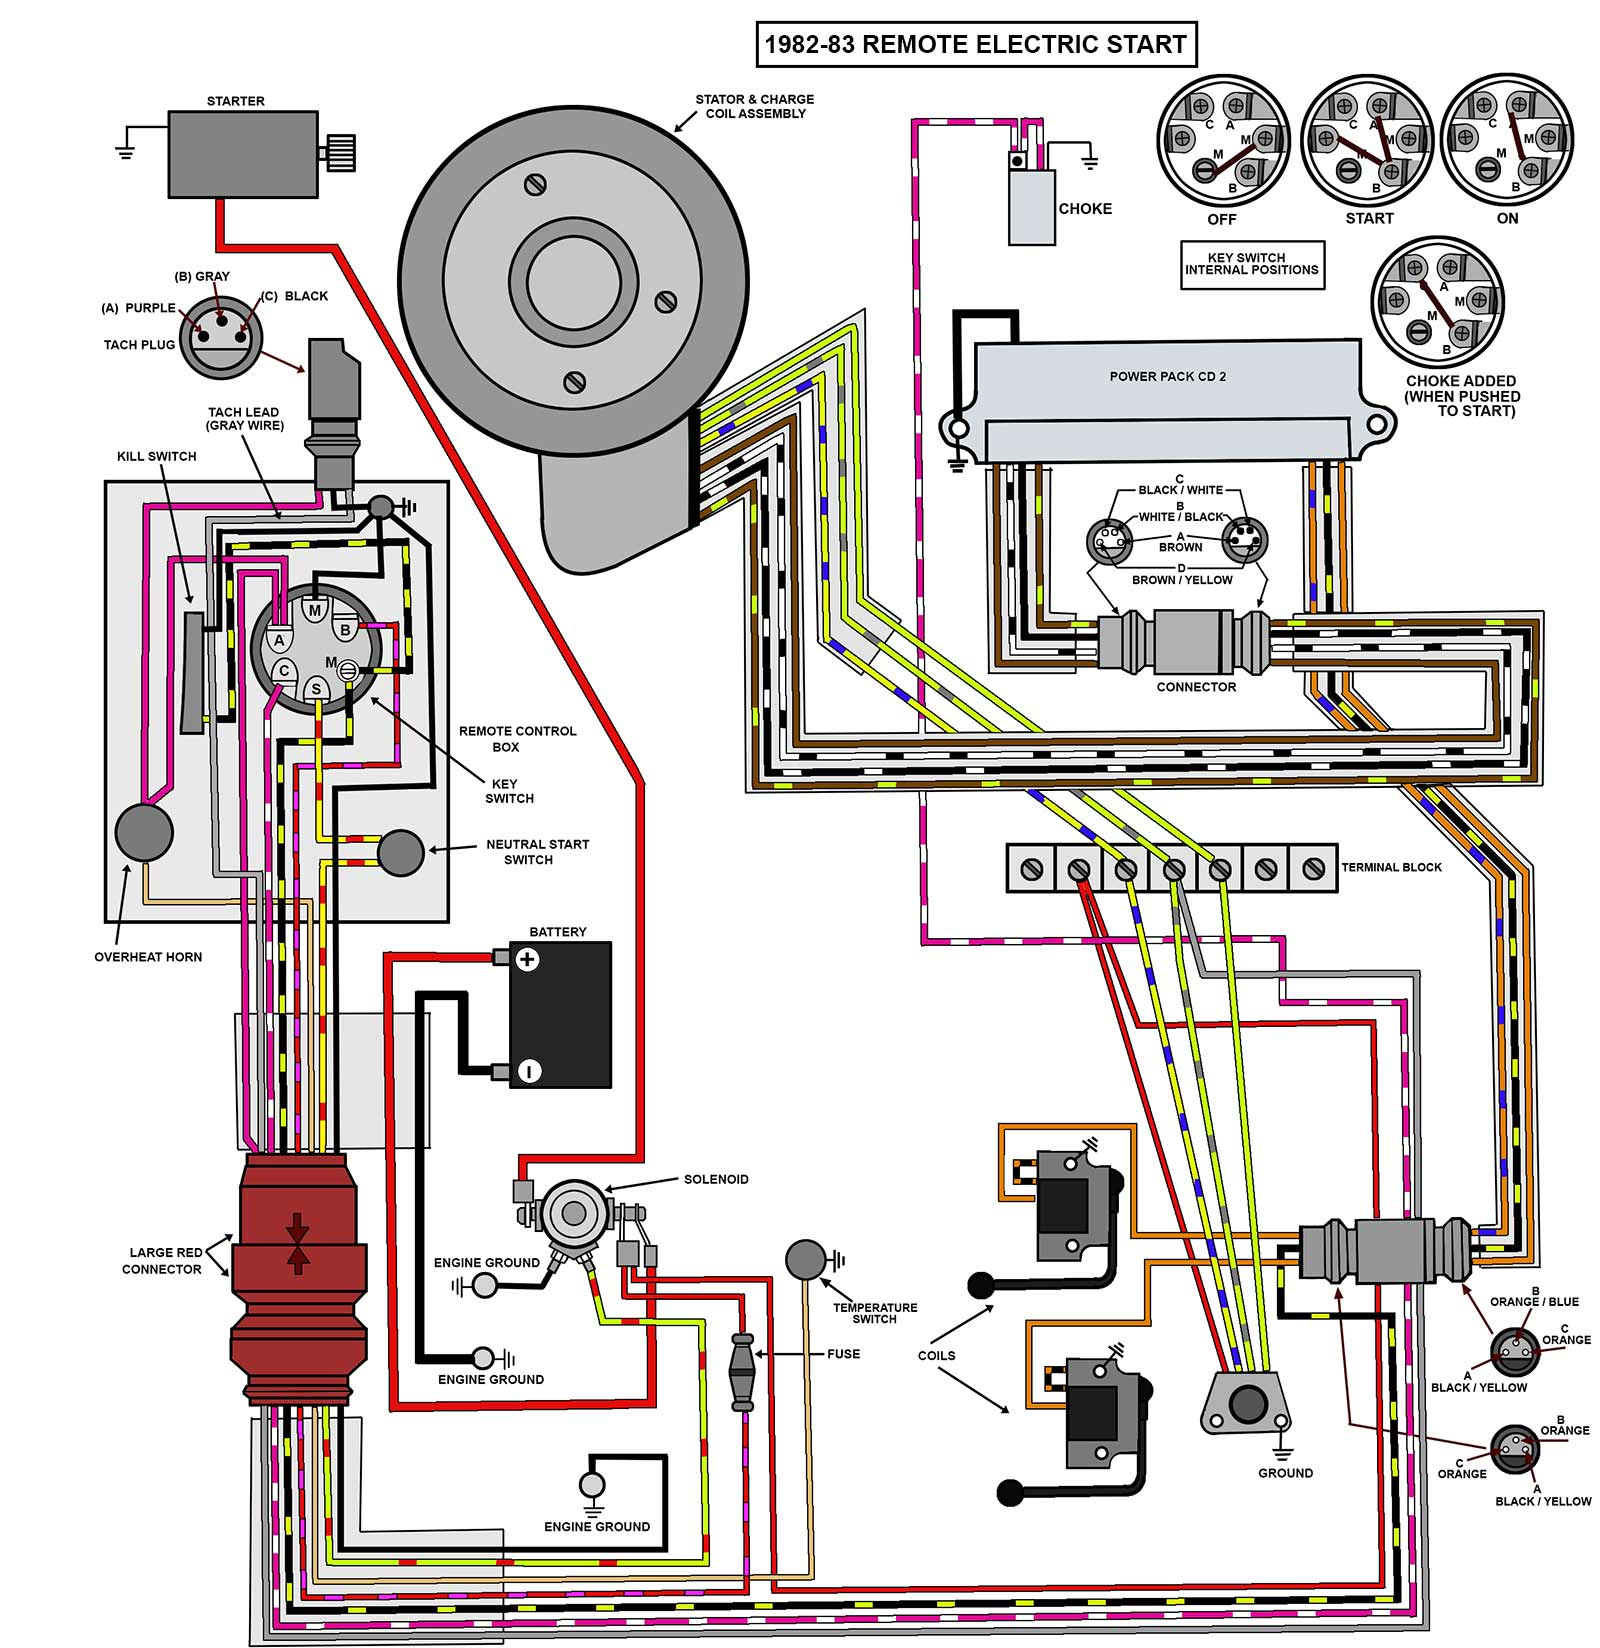 yamaha g2 wiring diagram land rover discovery radio evinrude johnson outboard diagrams -- mastertech marine